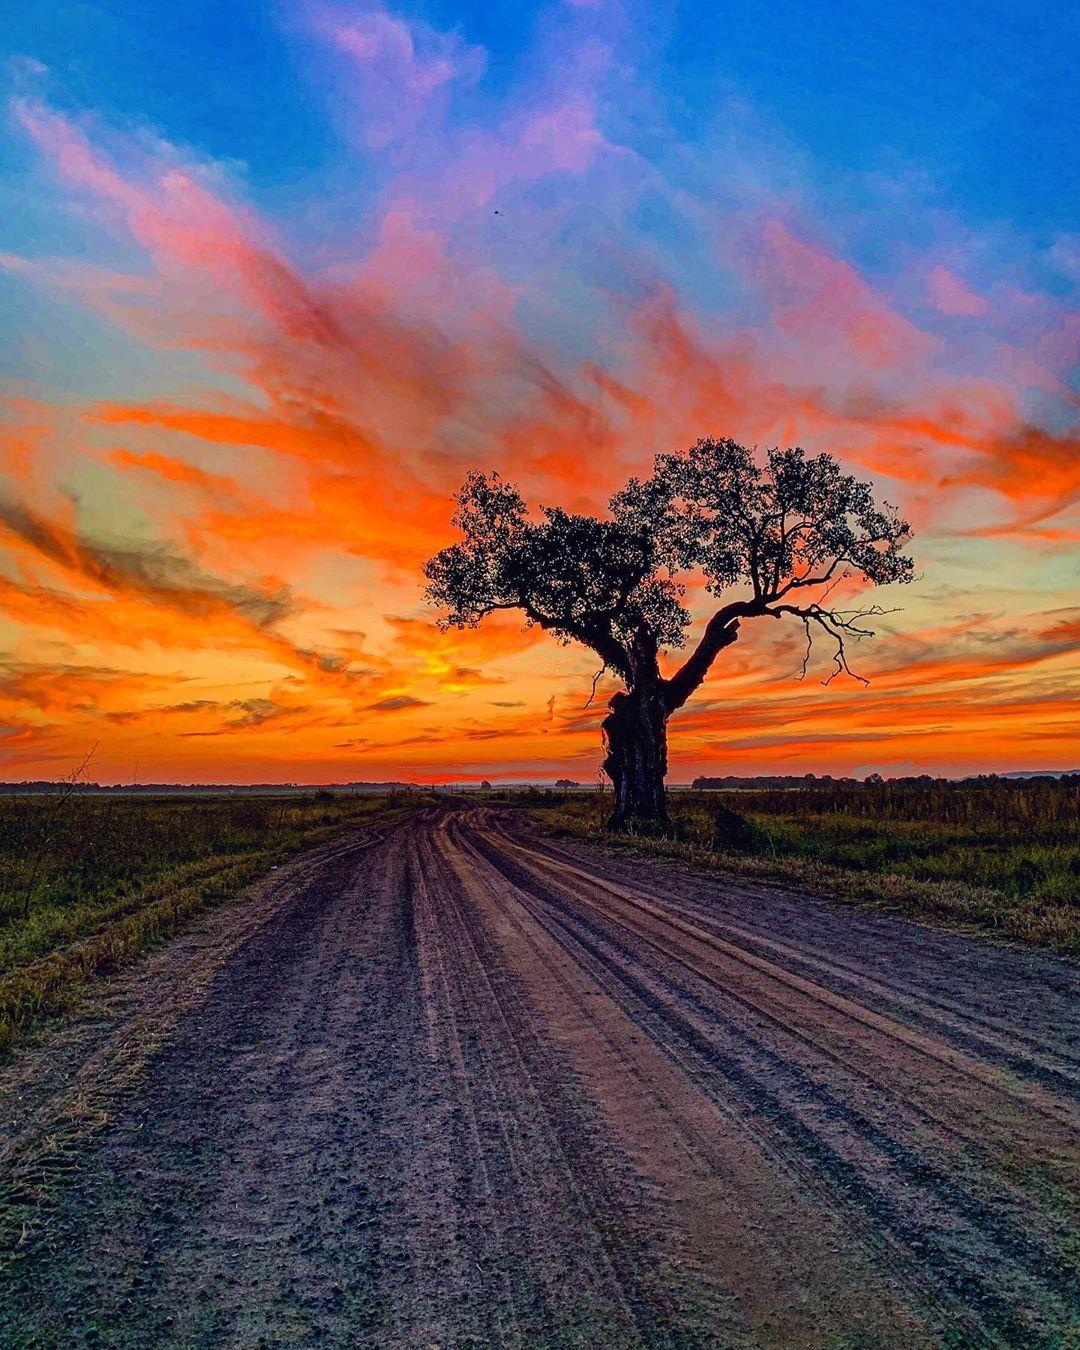 Pin By Nur Bilge On Light In 2020 Landscape Photography Sunset Pictures Landscape